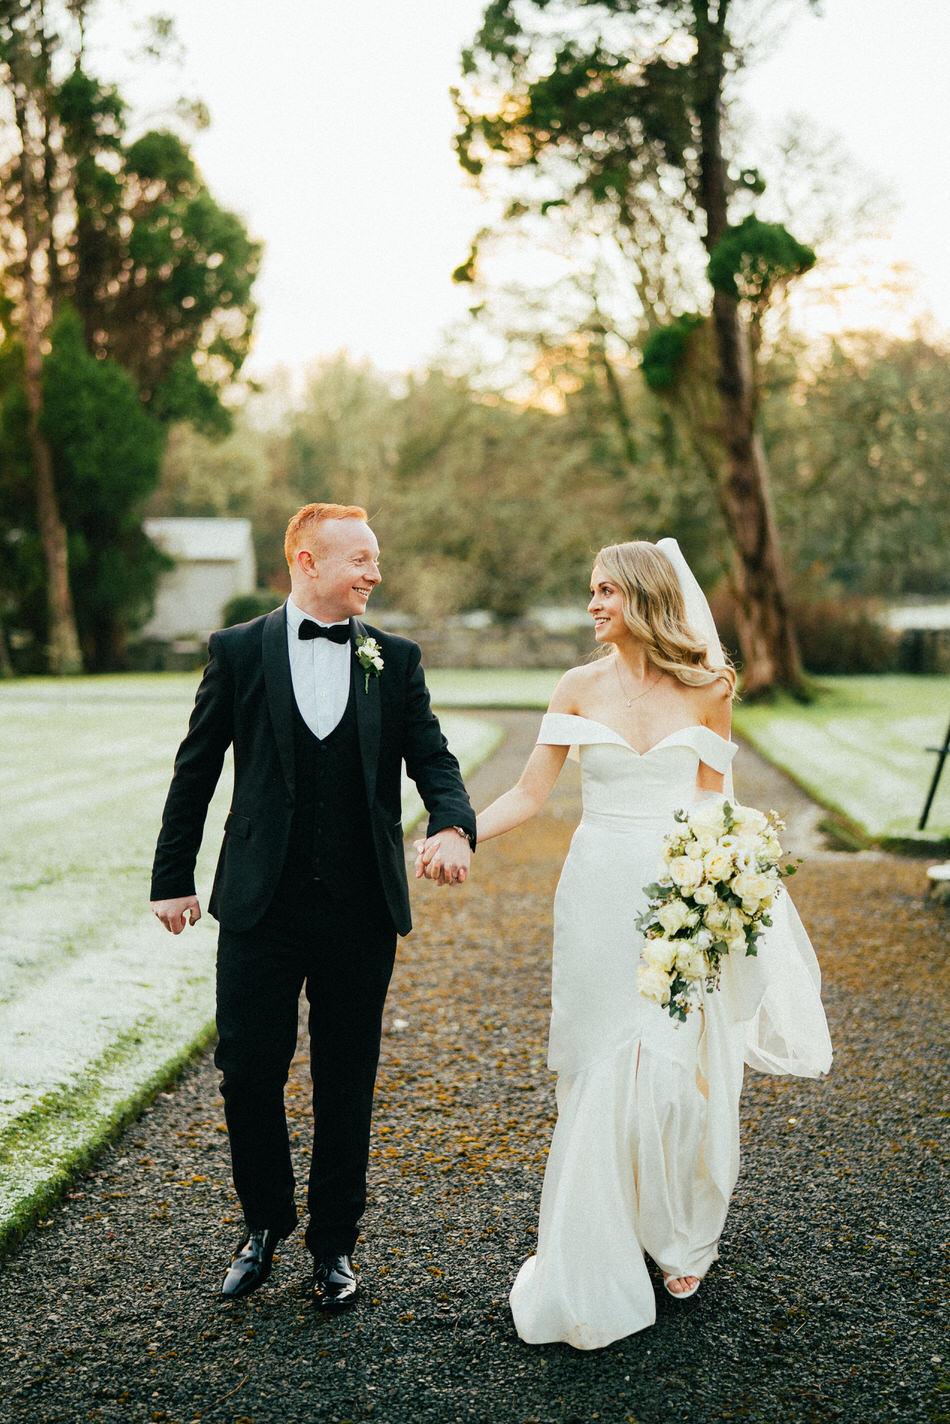 Castle-wedding-ireland-photos- 0205 147